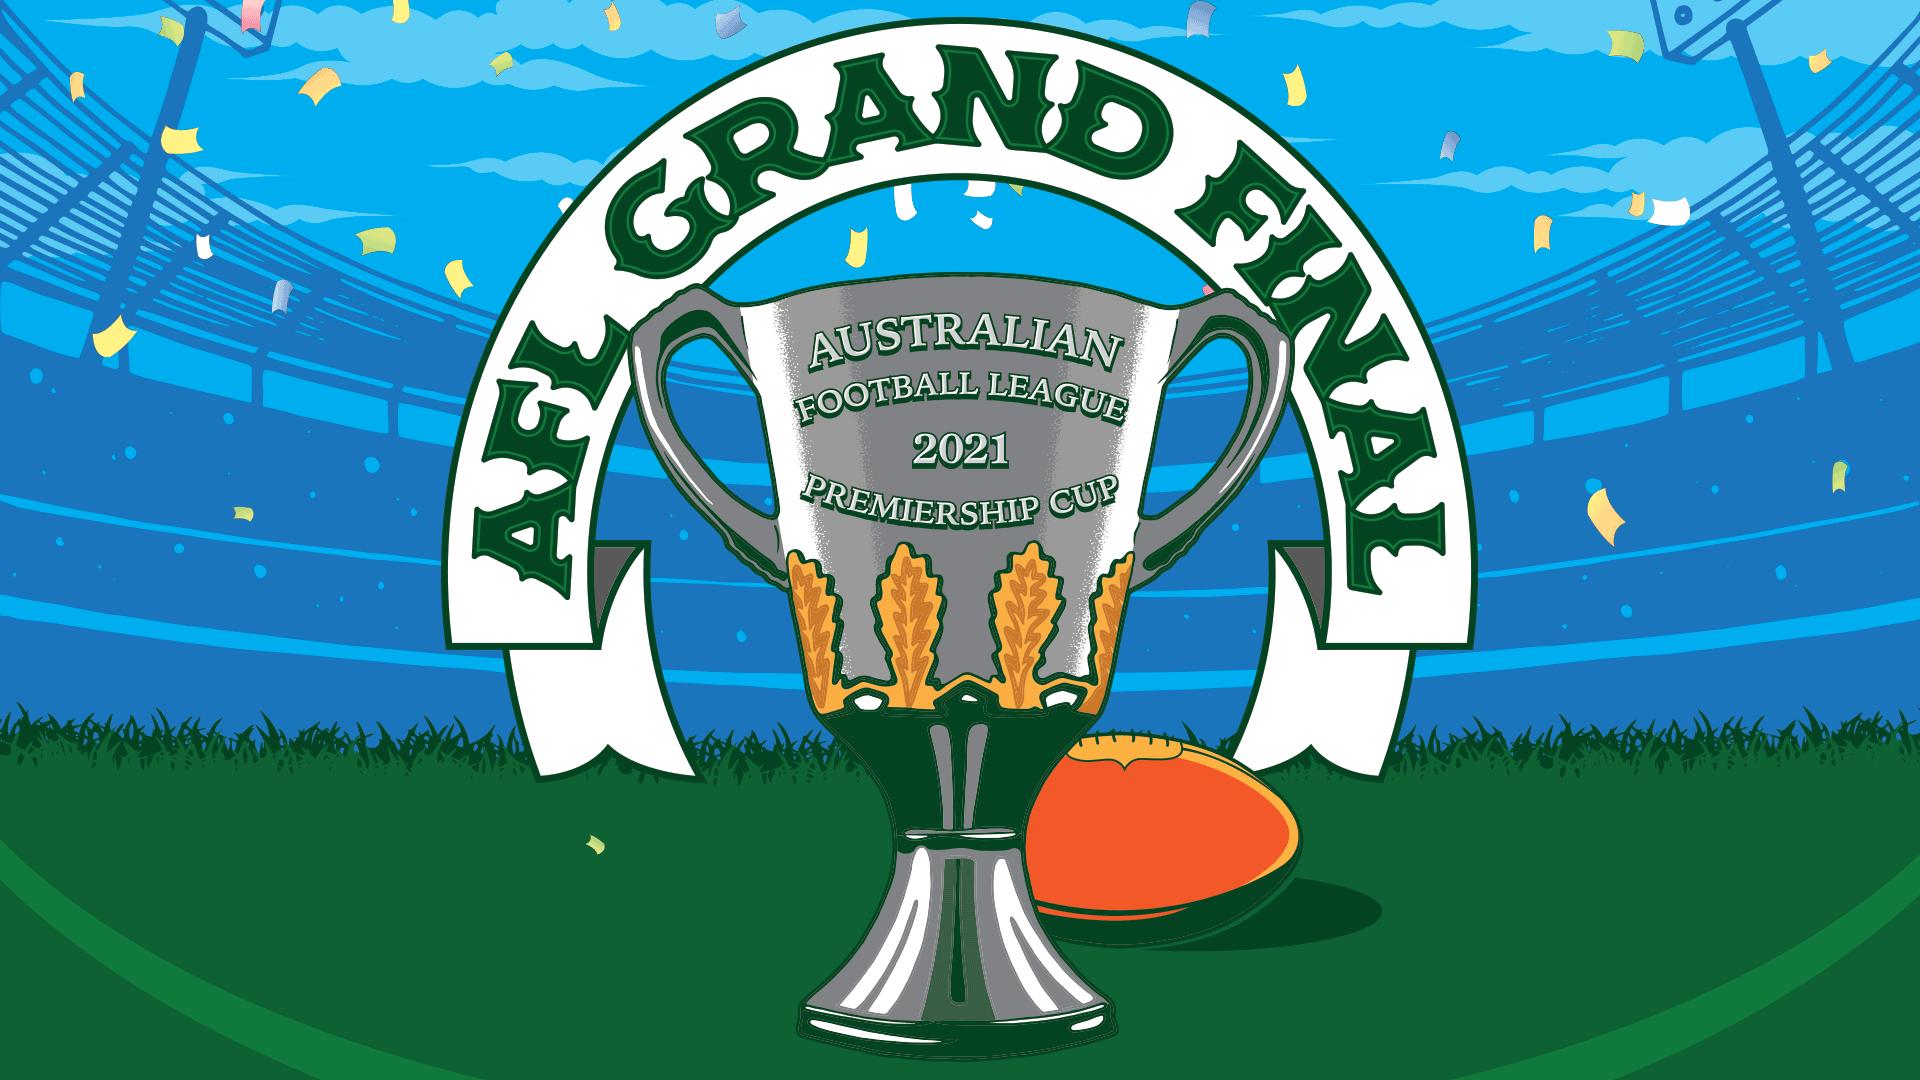 Afl grand final graphic